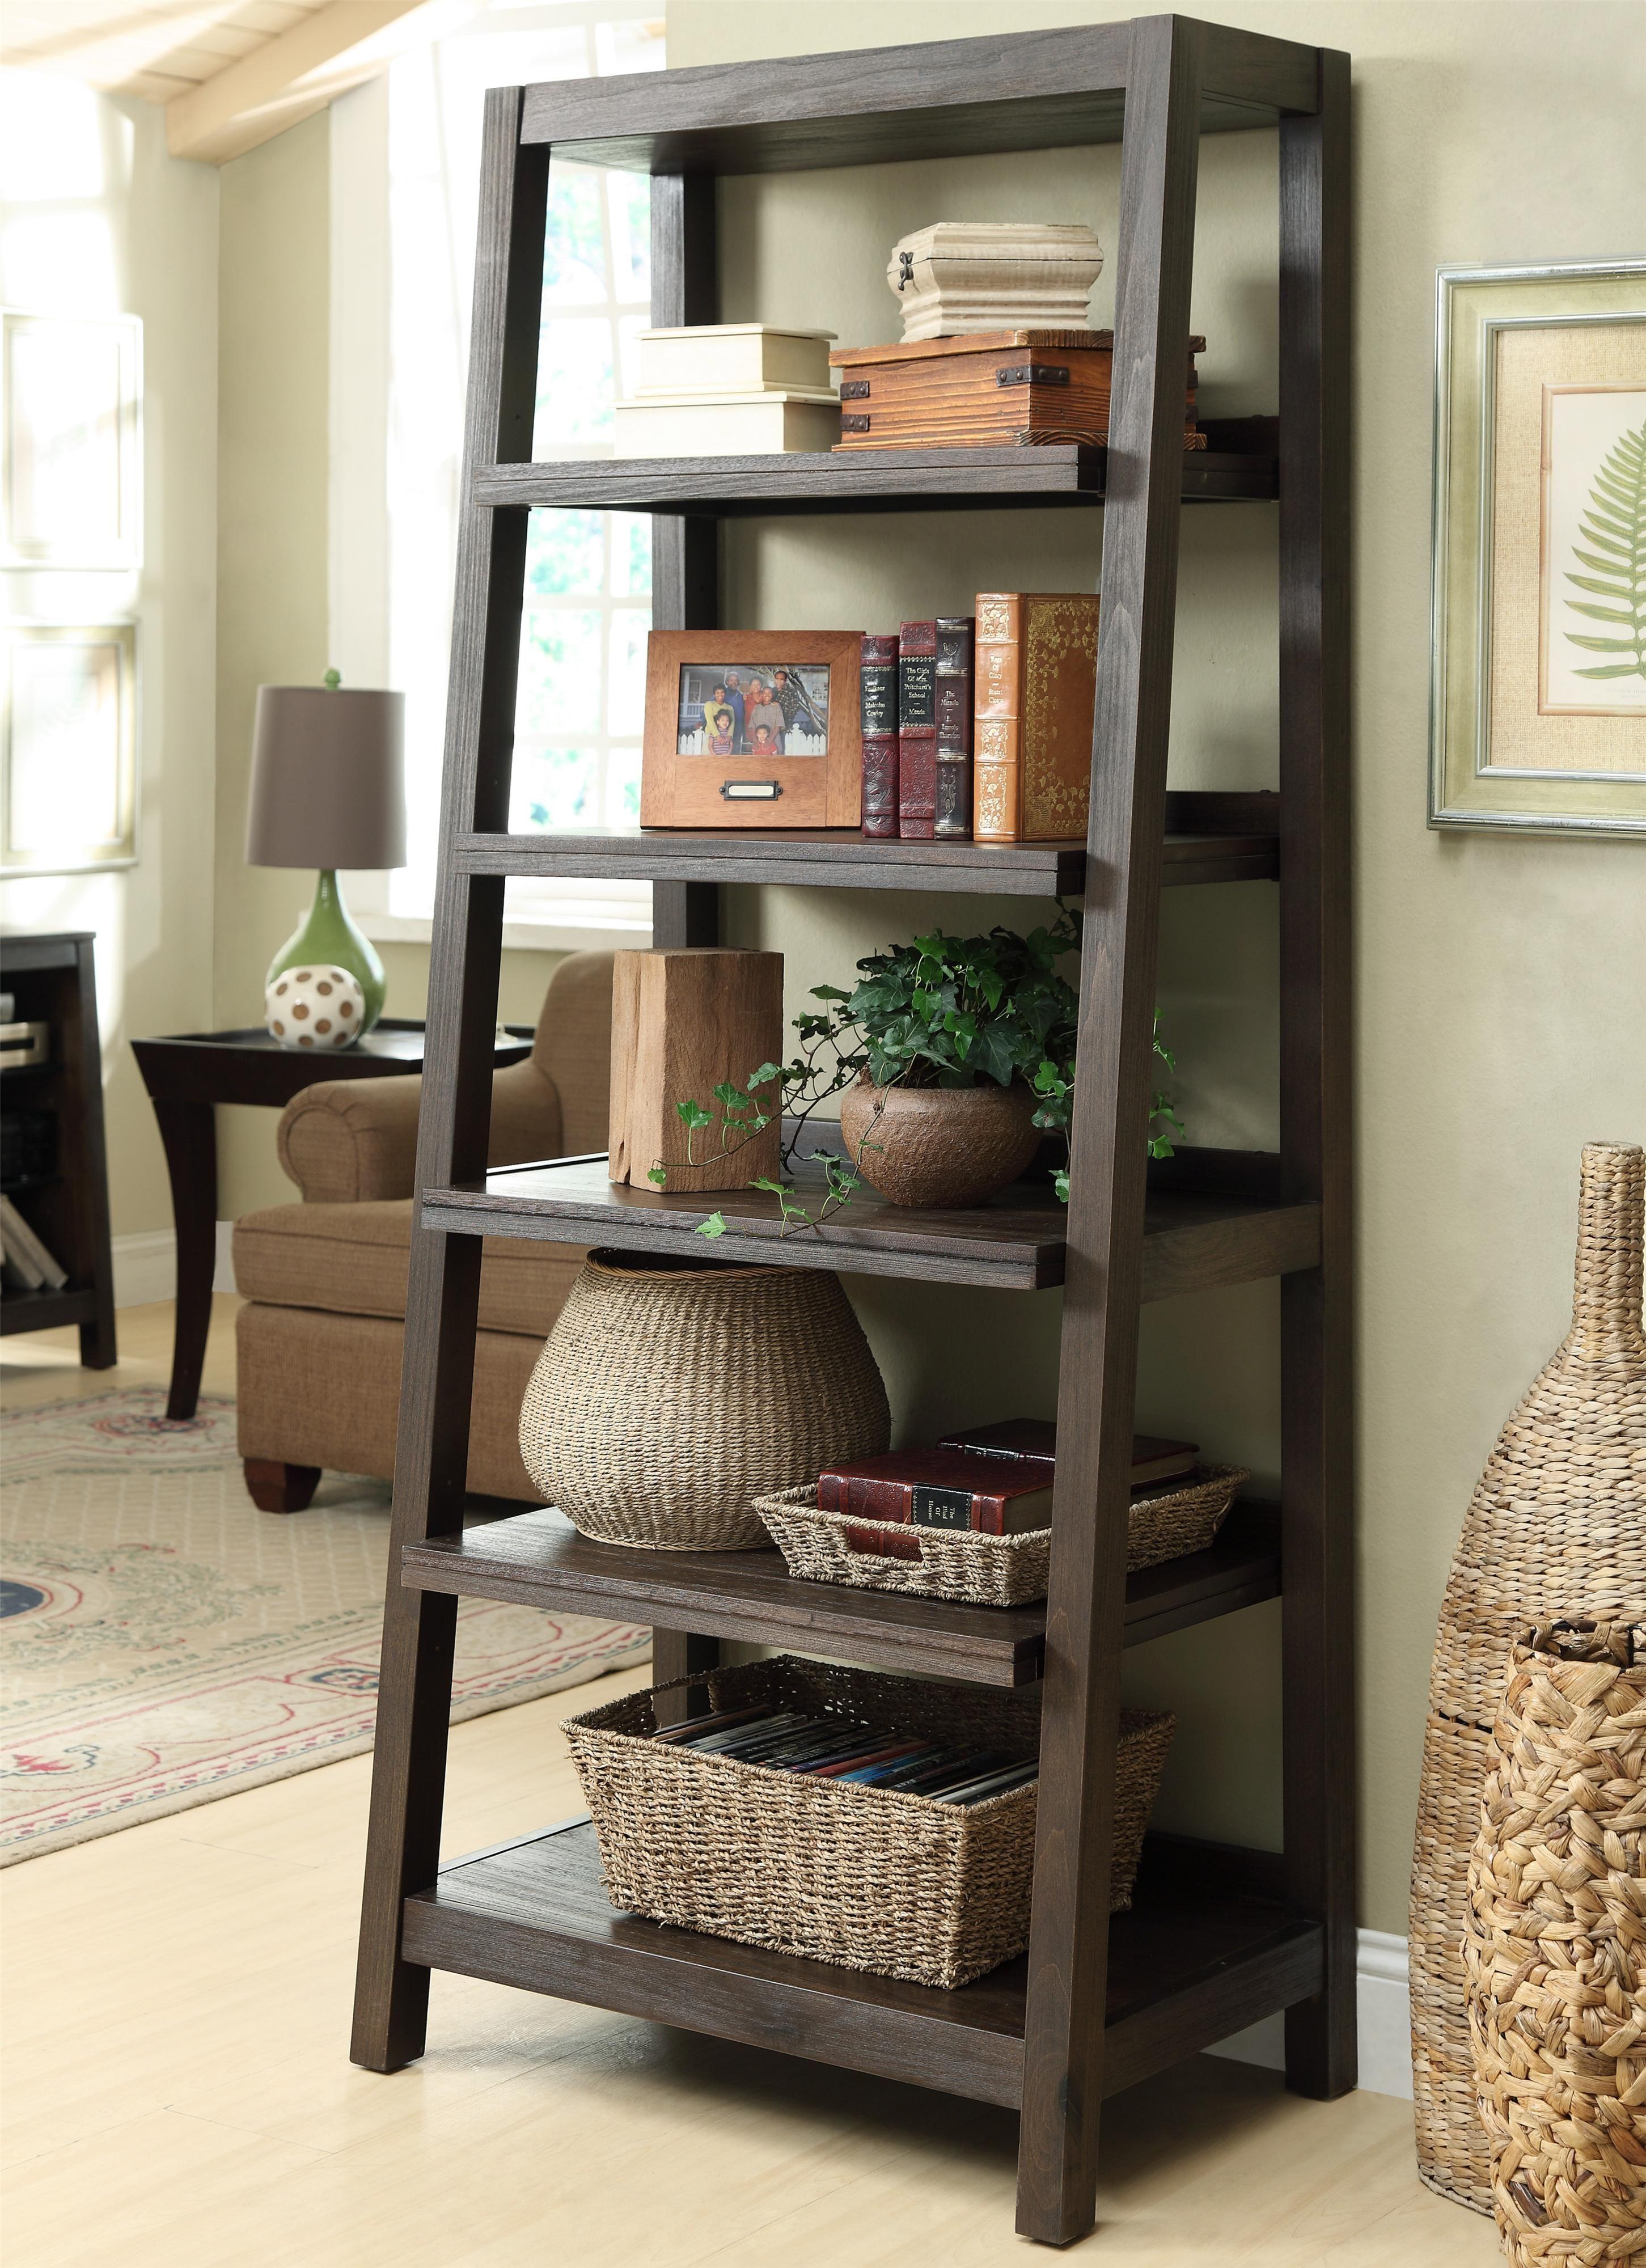 Image result for bookcase knick knacks